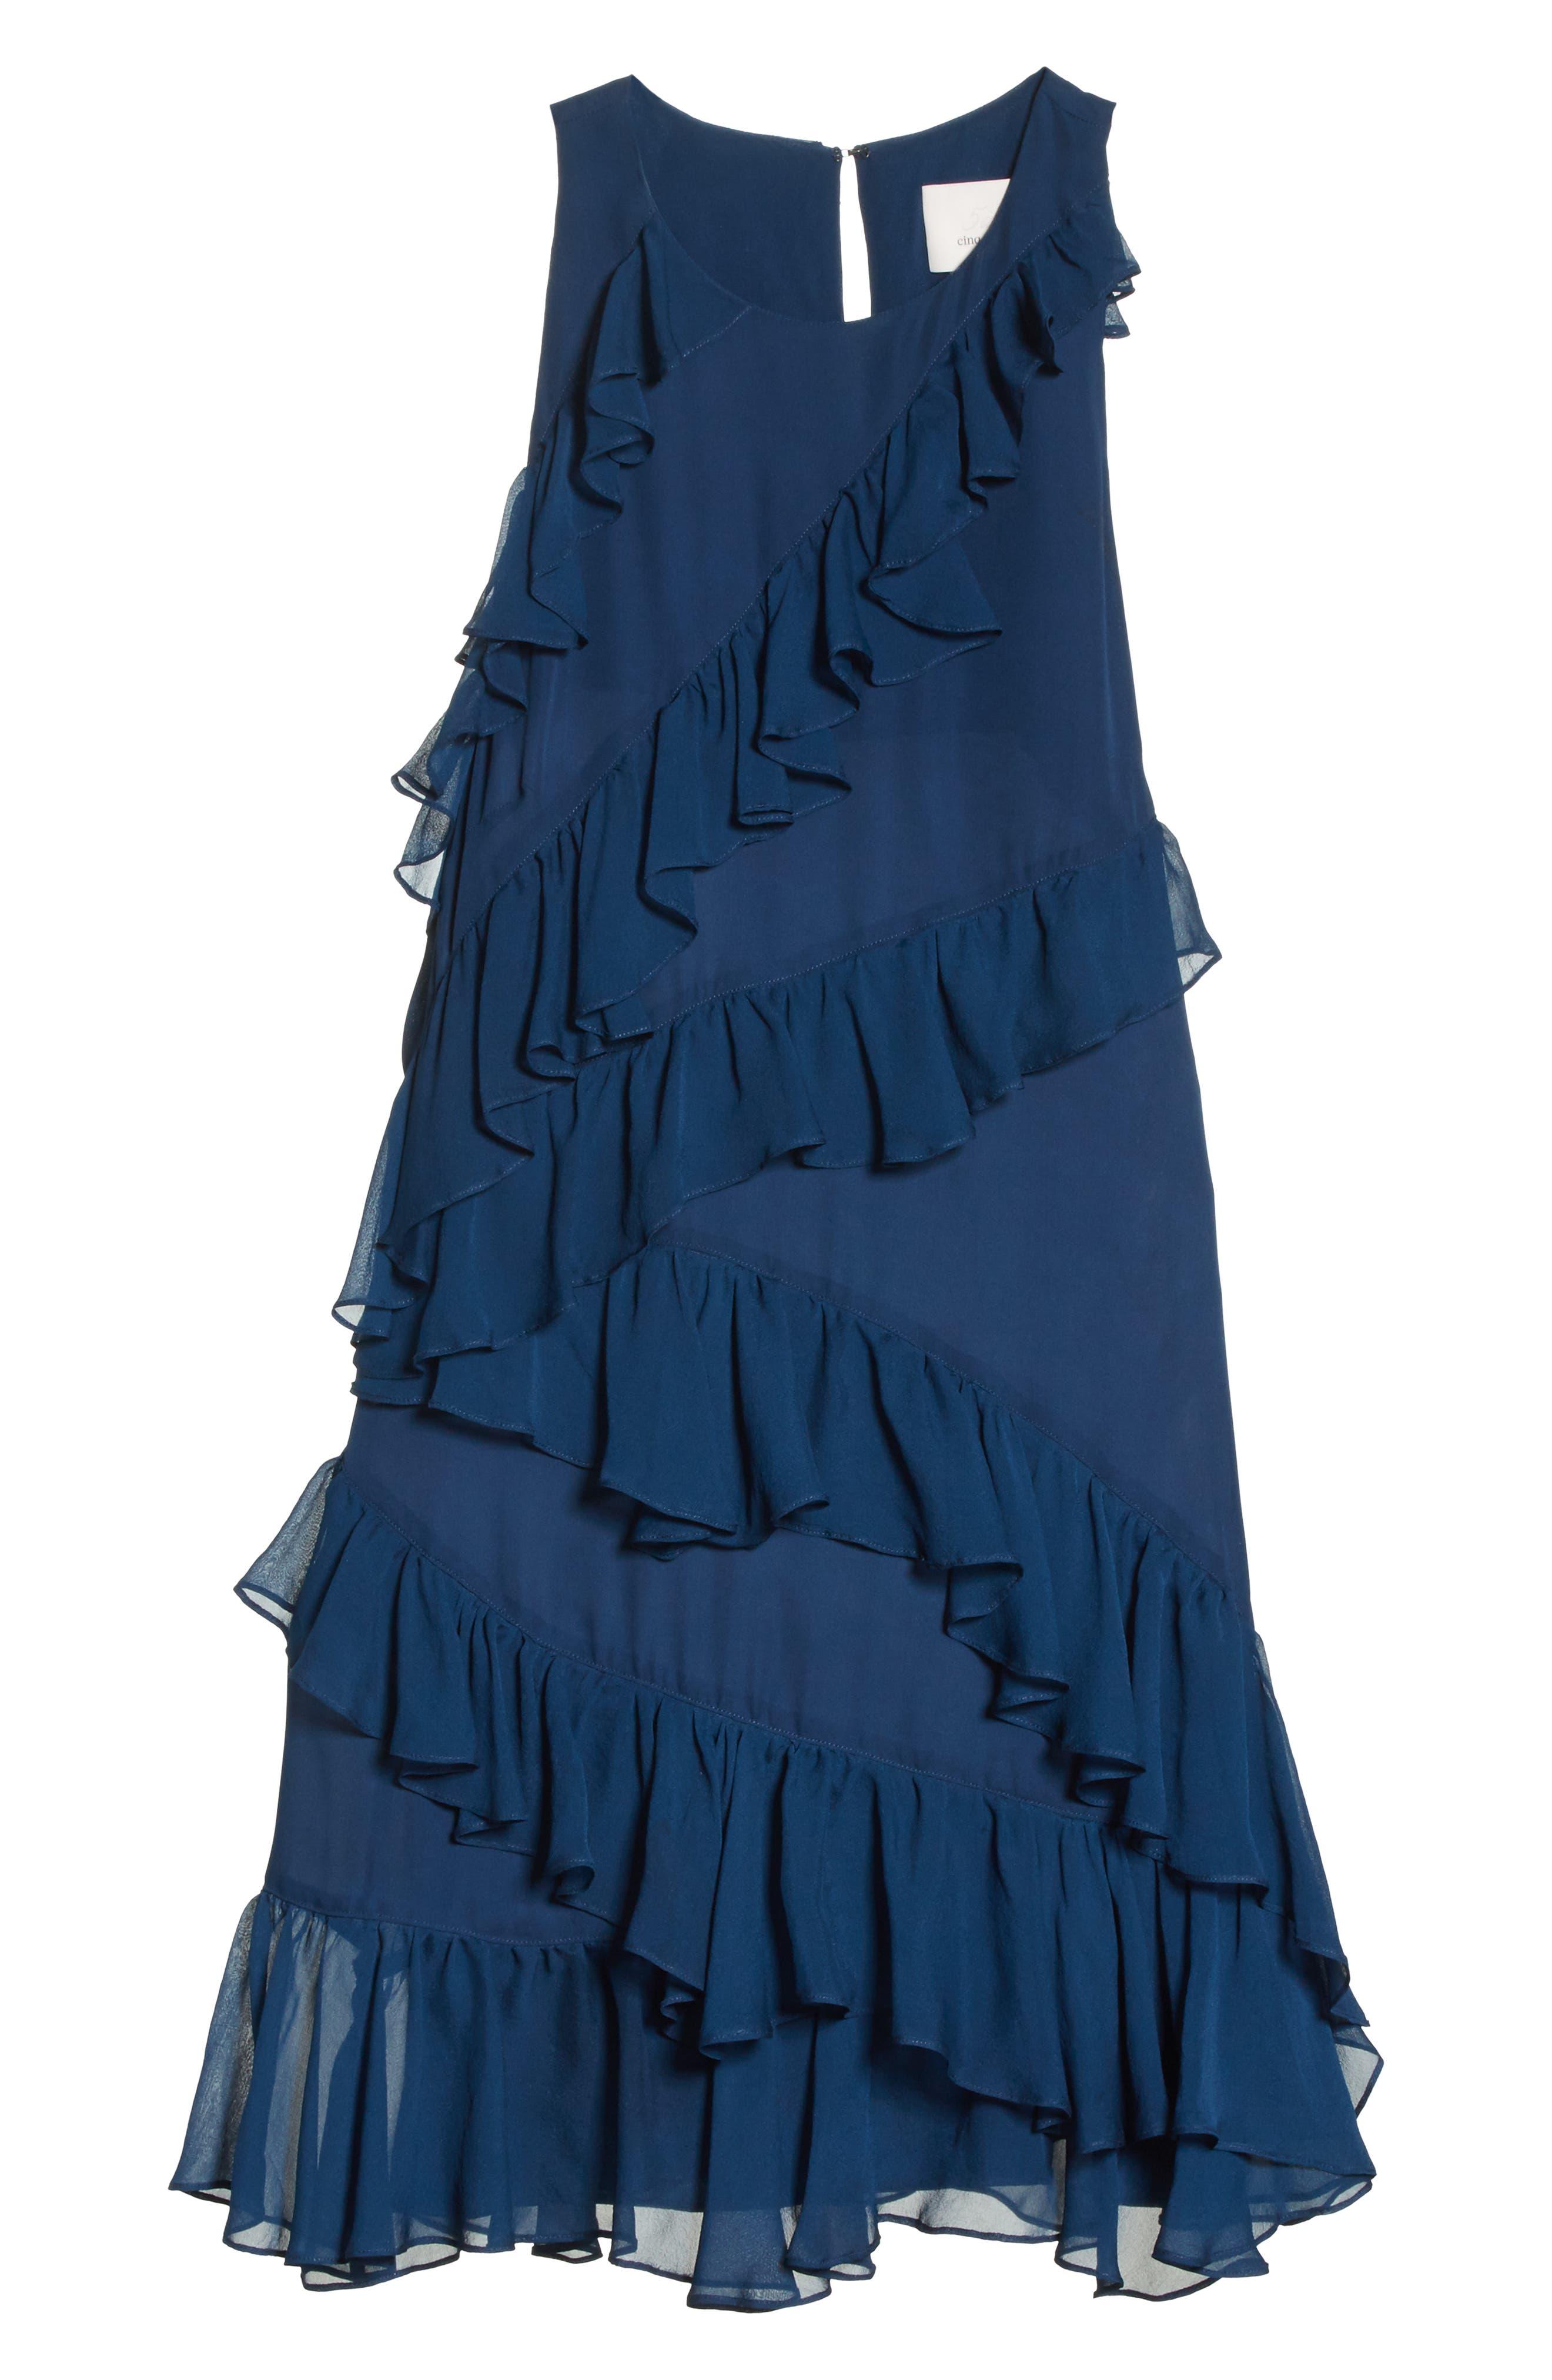 Taghrid Ruffle Silk Dress,                             Alternate thumbnail 6, color,                             495